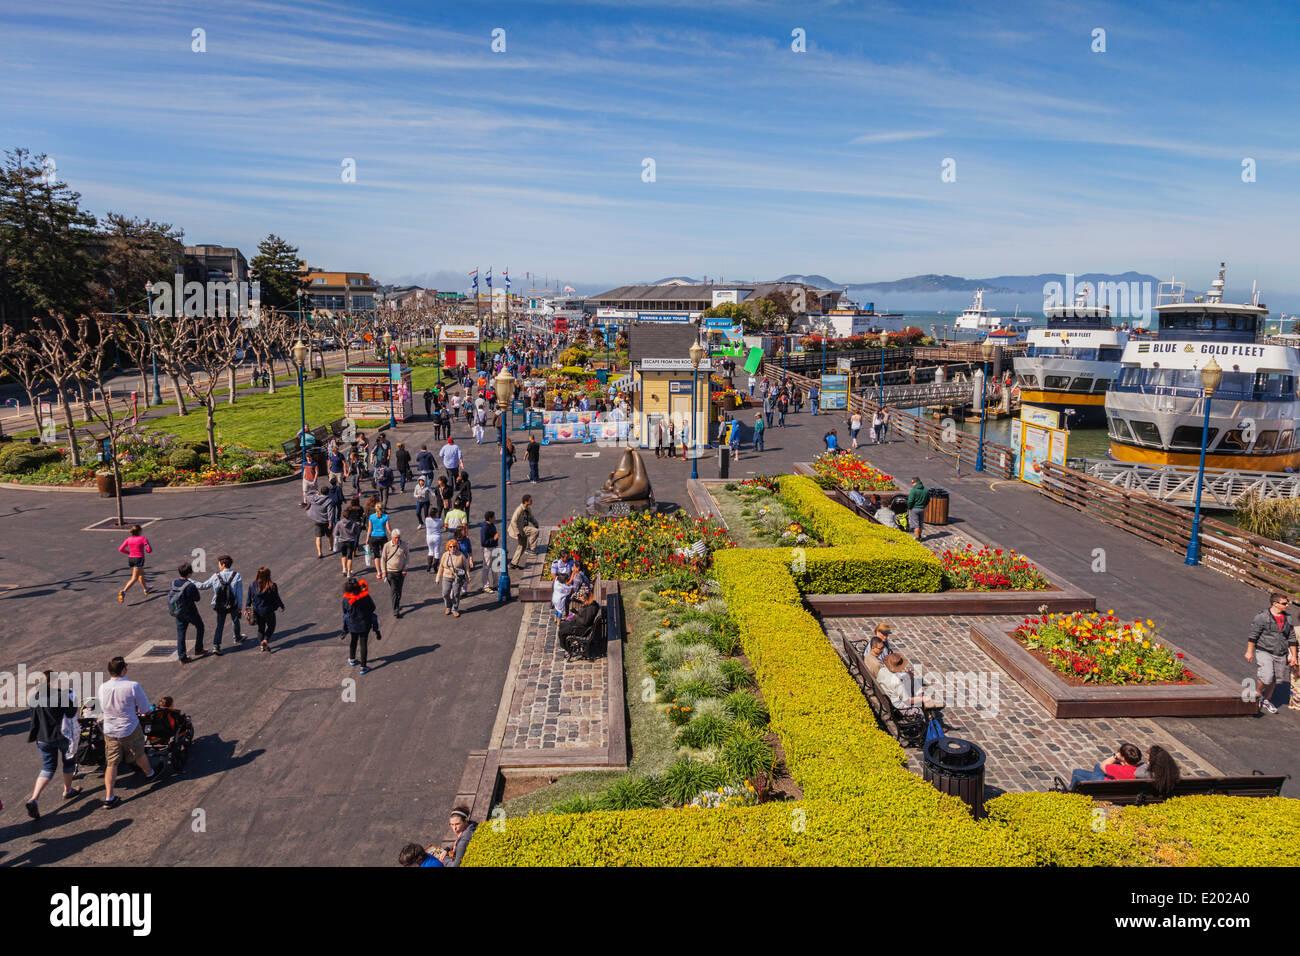 San Francisco, the Embarcadero, near Pier 39. - Stock Image